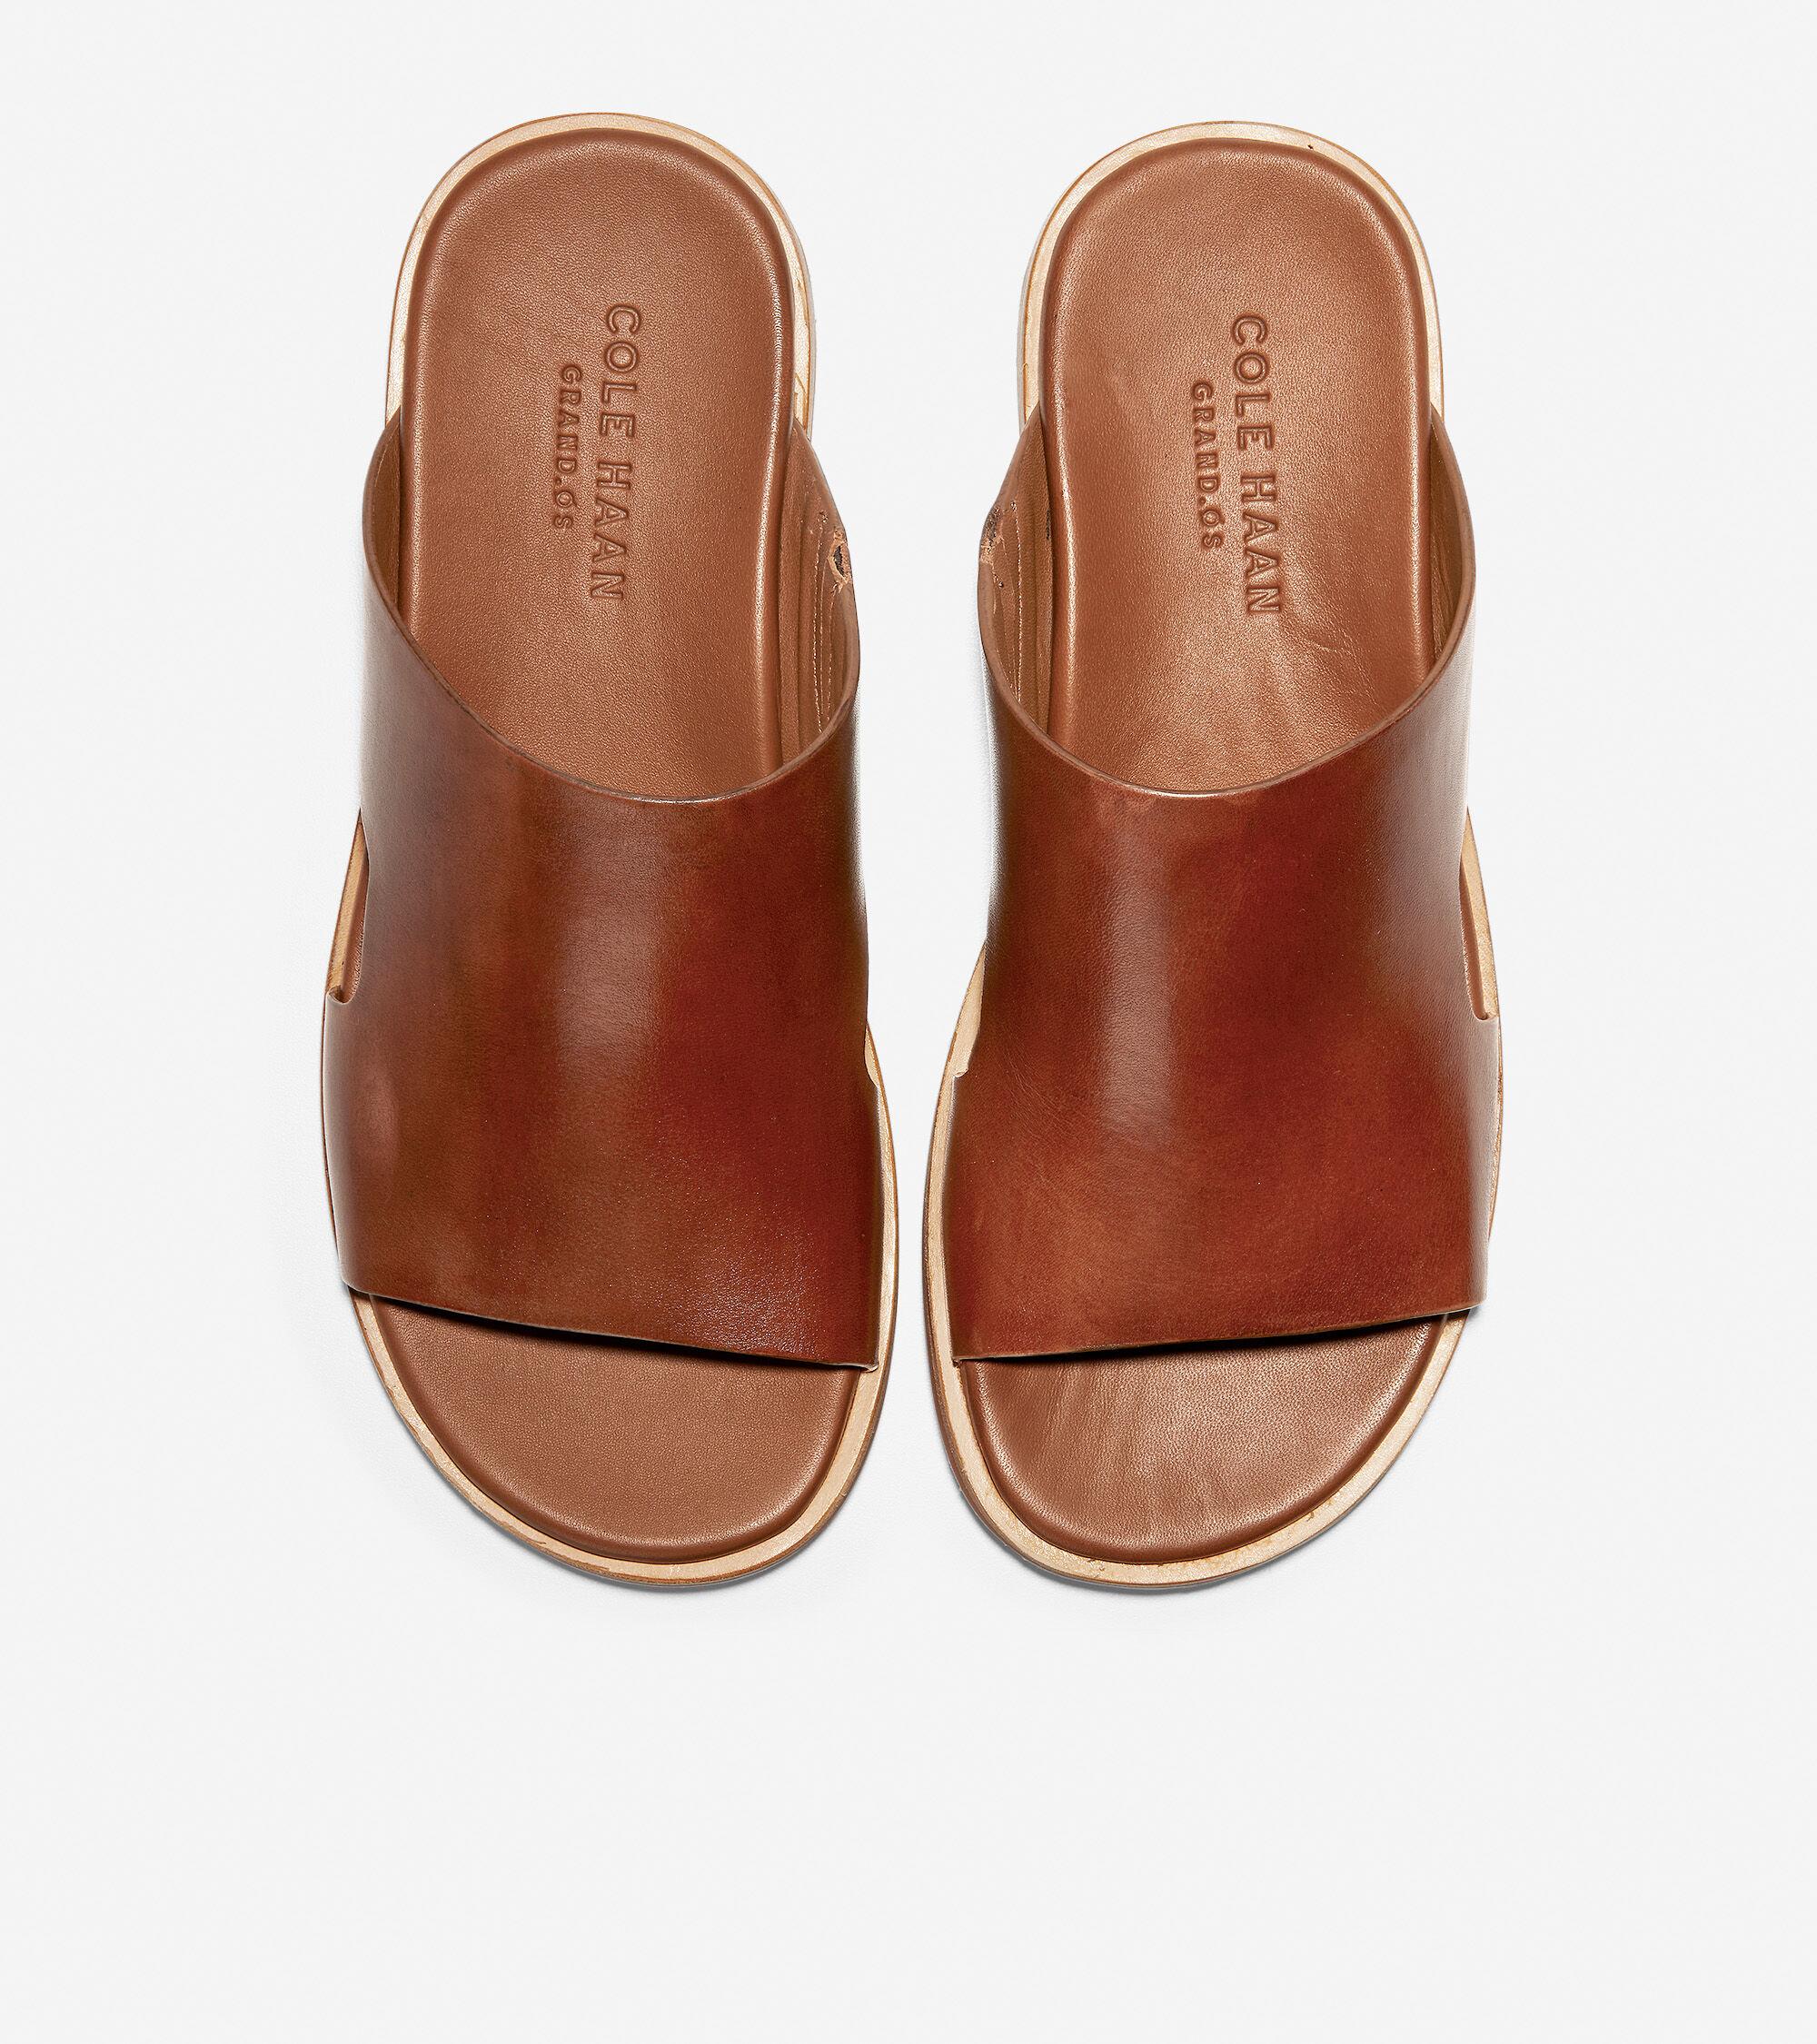 Goldwyn Slide Sandal in British Tan